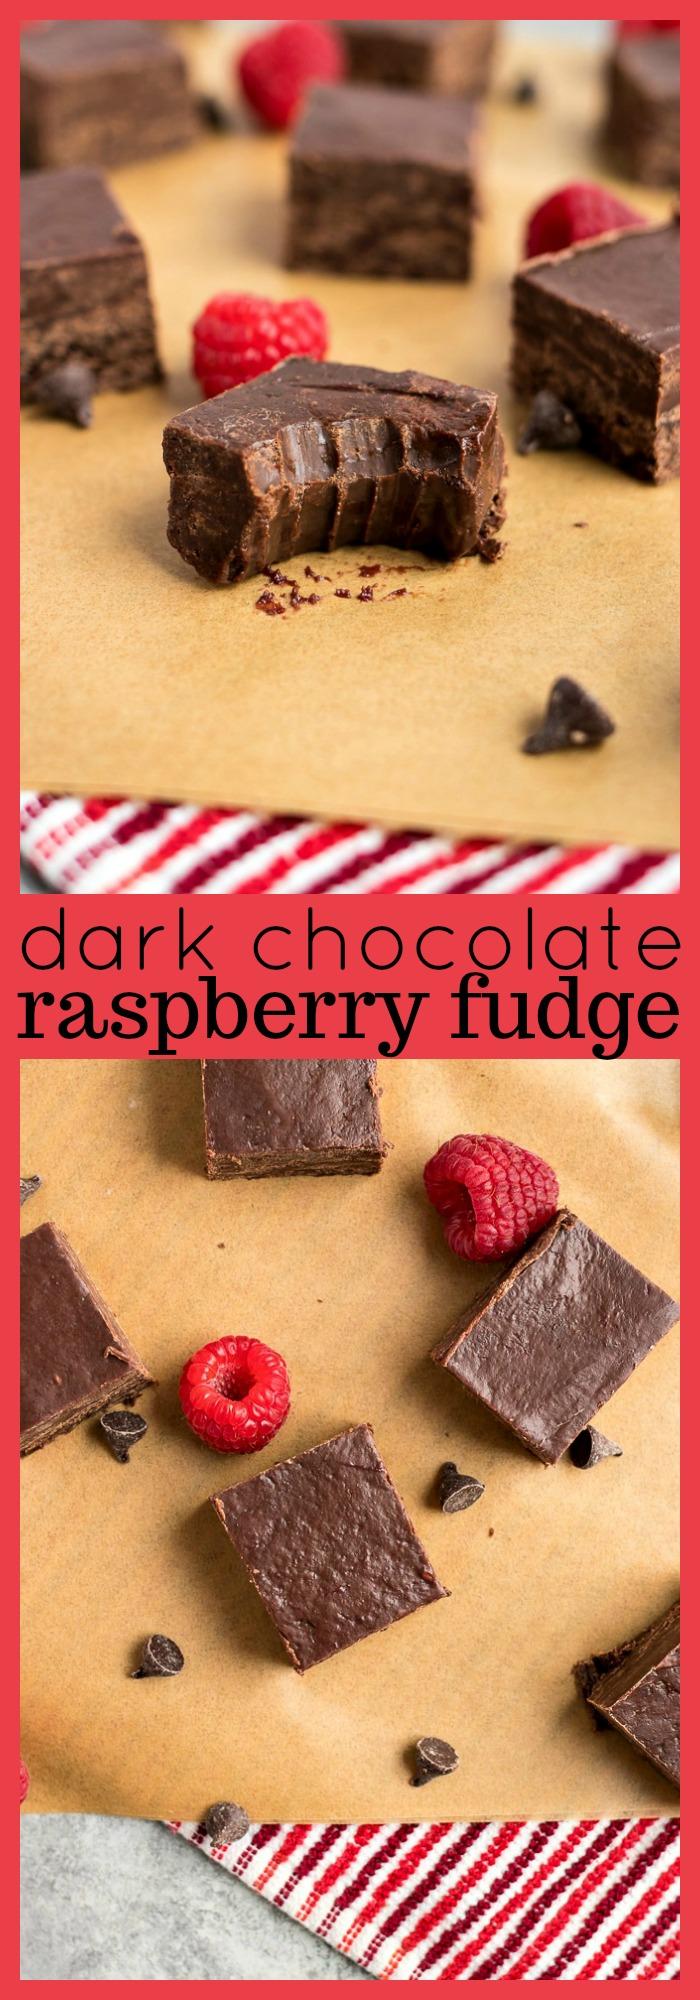 Dark Chocolate Raspberry Fudge photo collage